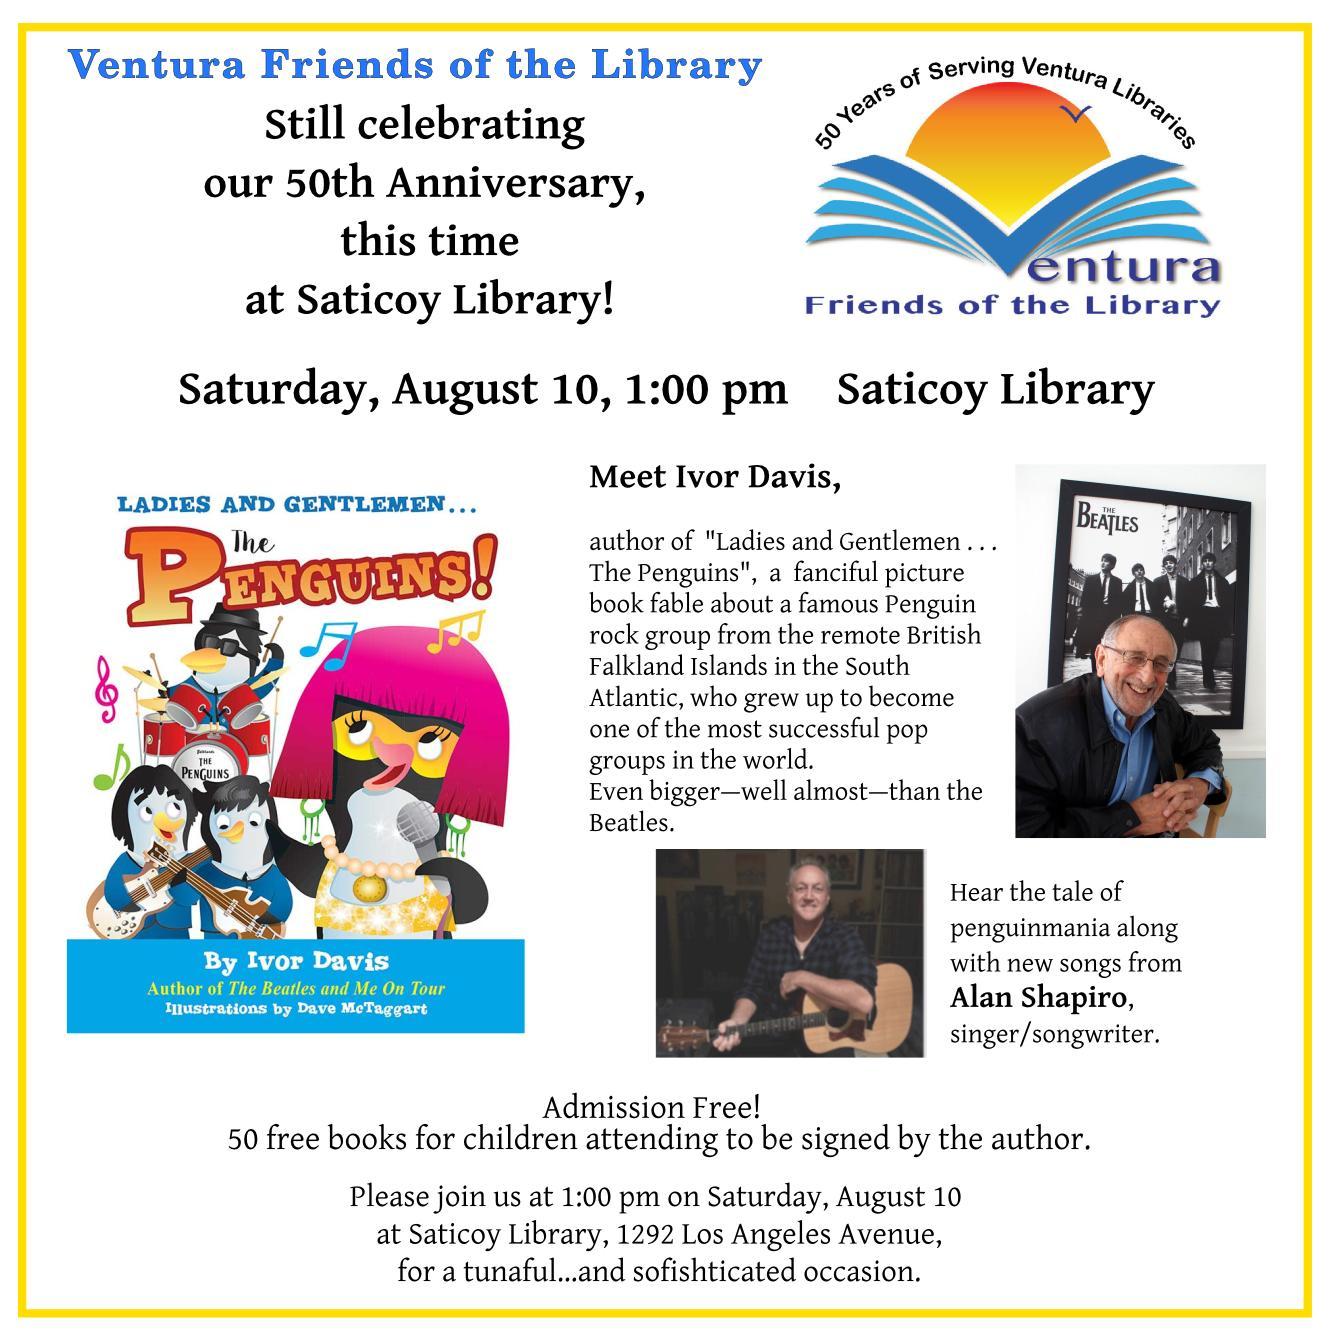 Saticoy – Ventura FOL 50th Anniversary Celebration with Ivor